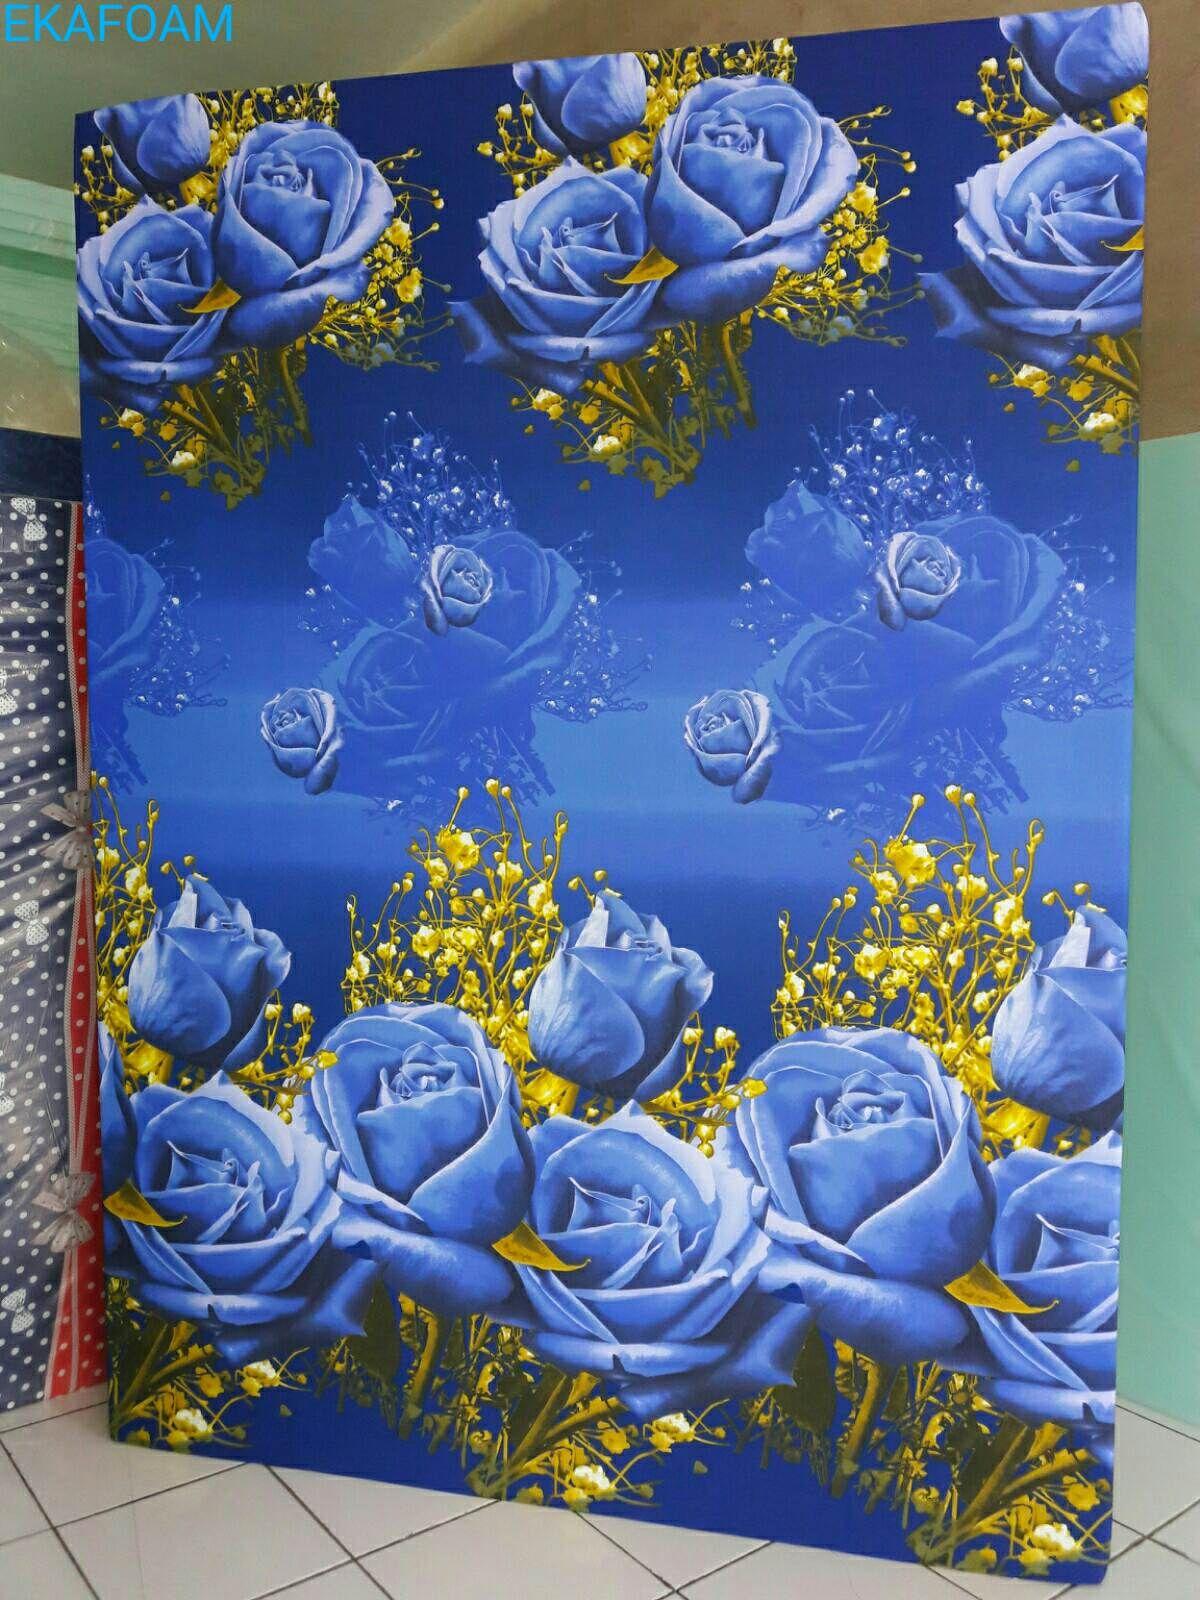 Kasur Inoac Terbaru 2017 Inoac Motif Bunga Tulip Biru Inoac Ekafoam 0896 3610 2158 Detail Produk Http Ekafoam Blogspot Com P Harga Kasur Inoac Terbaru 201